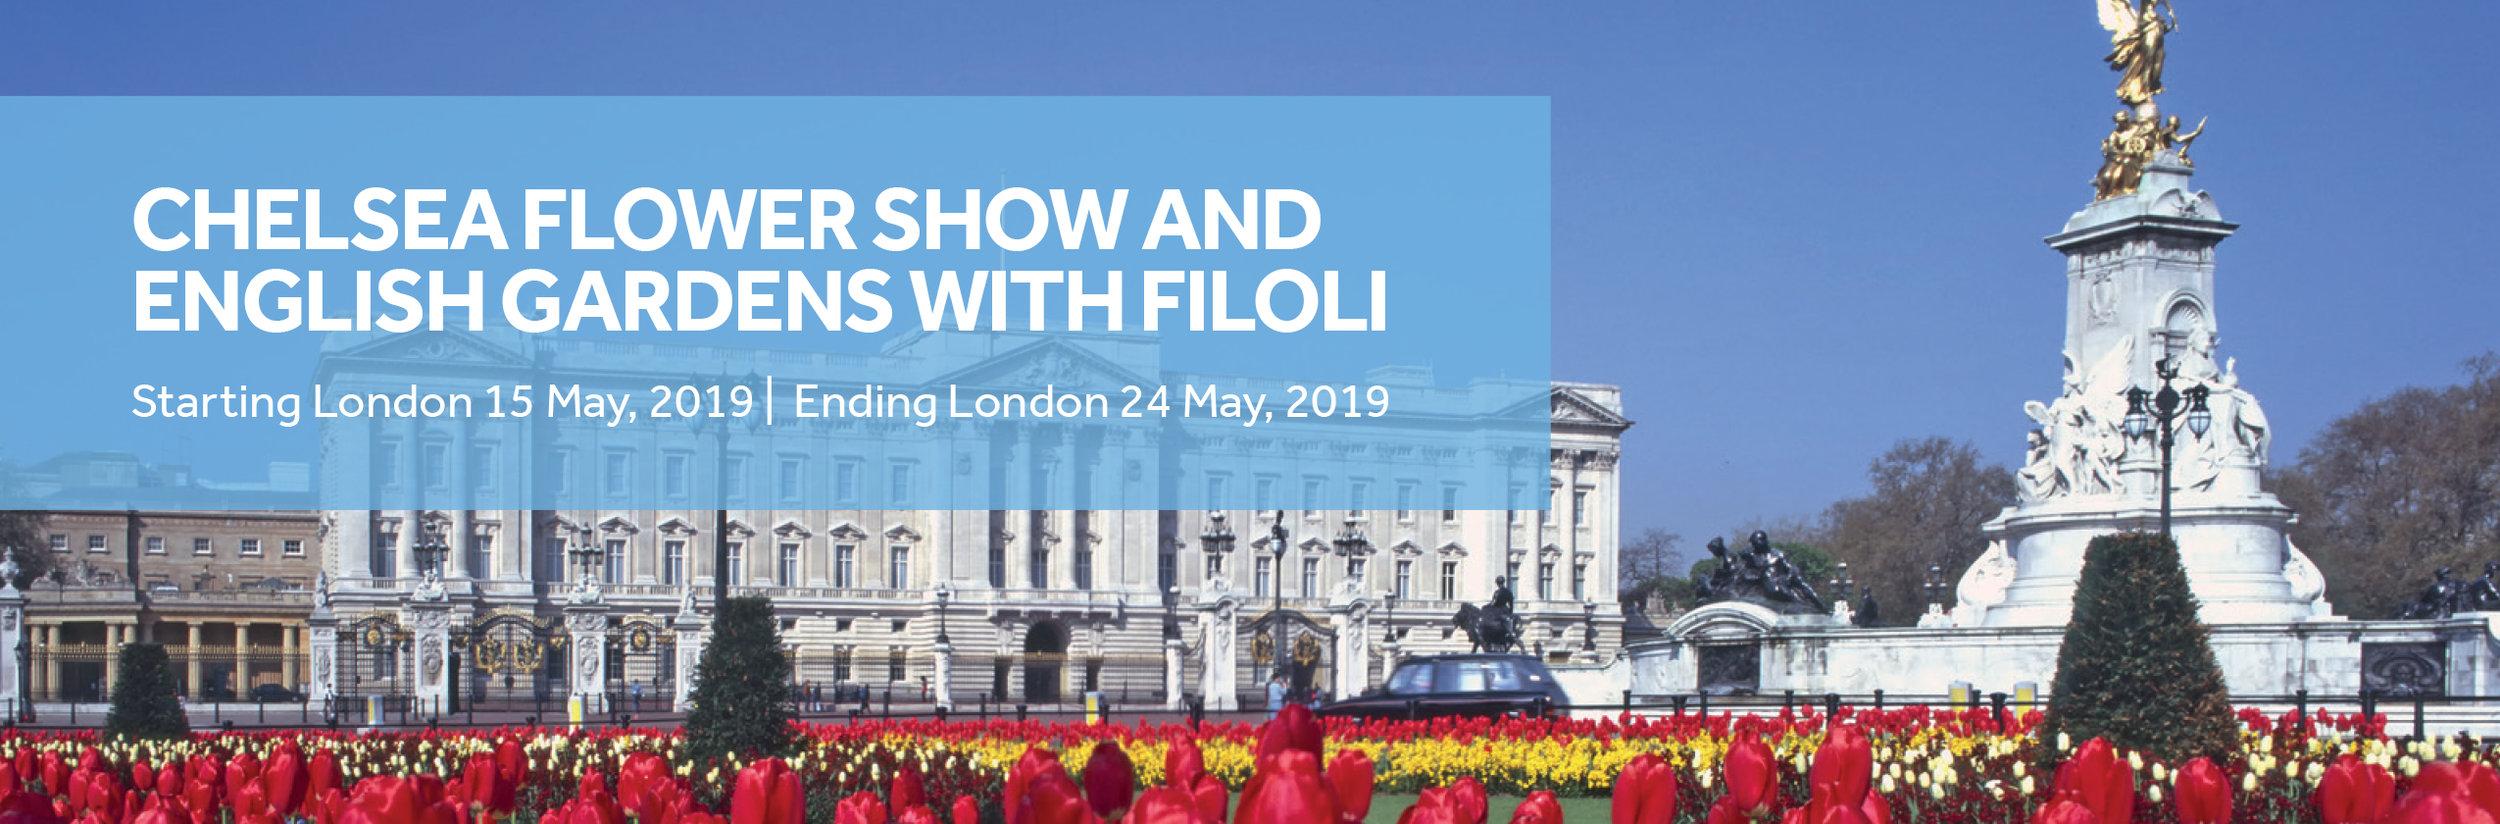 Chelsea Flower Show & English Gardens May 2019-1.jpg